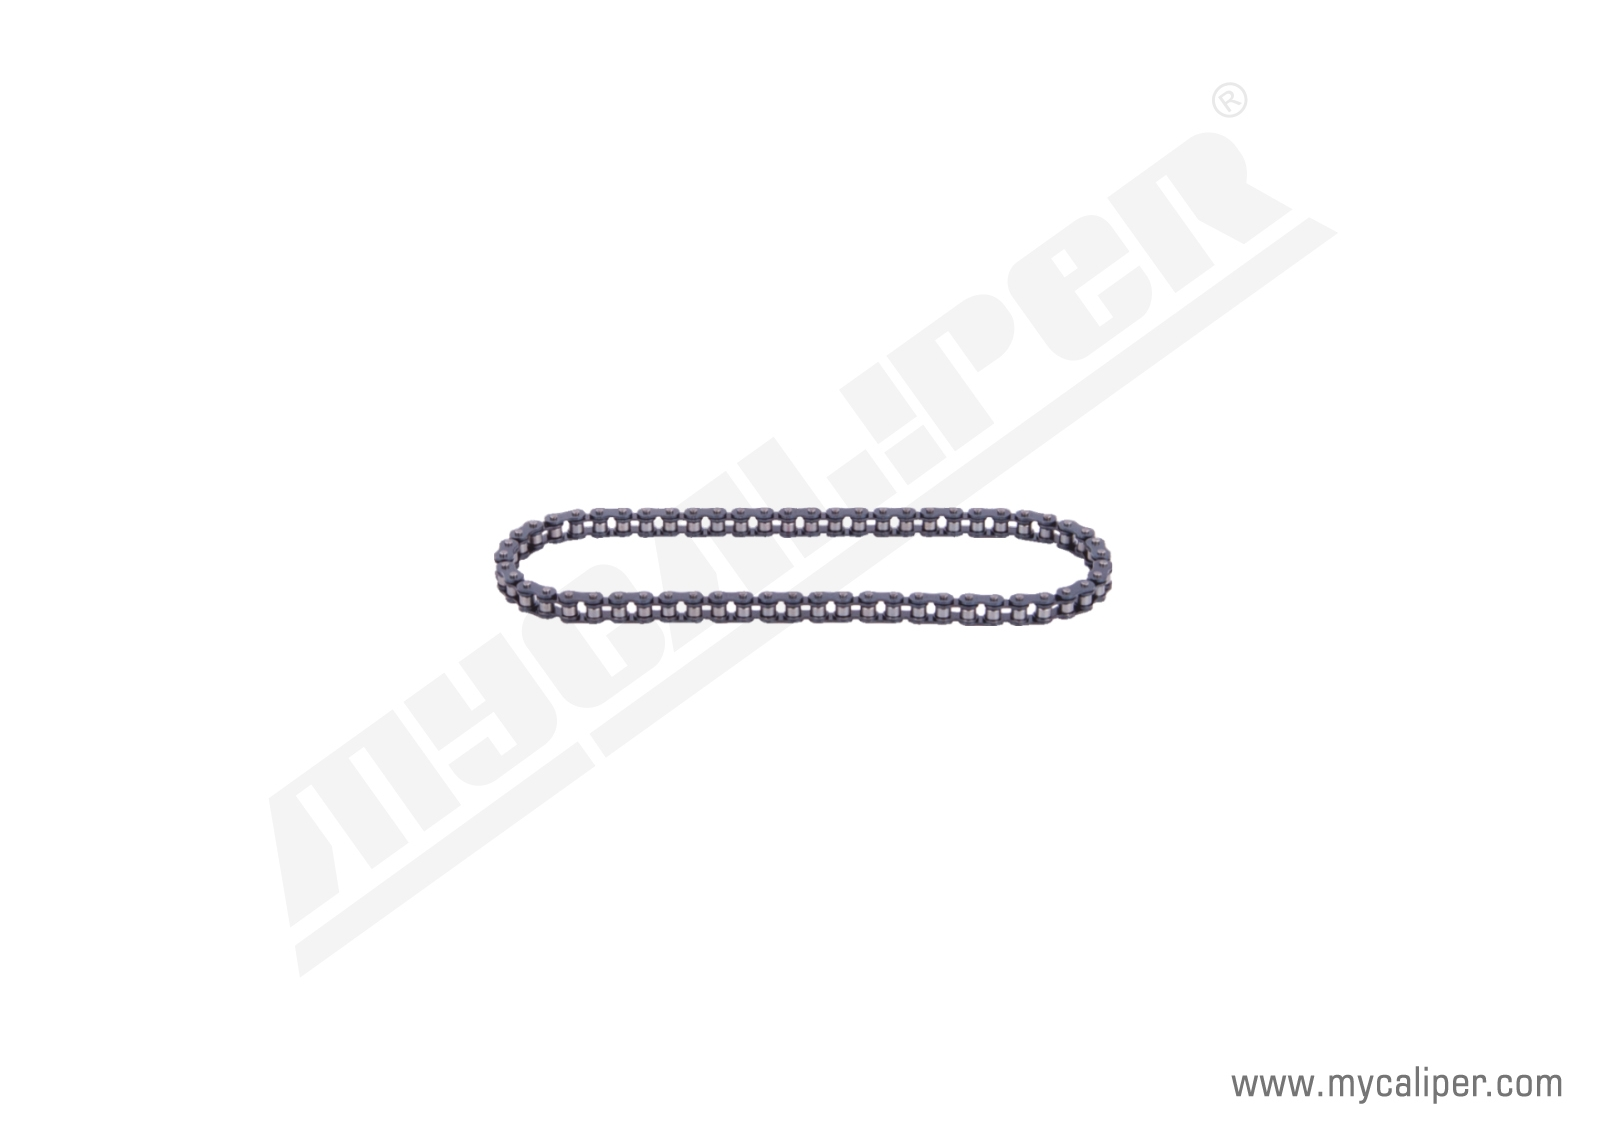 Caliper Chain (29 links)